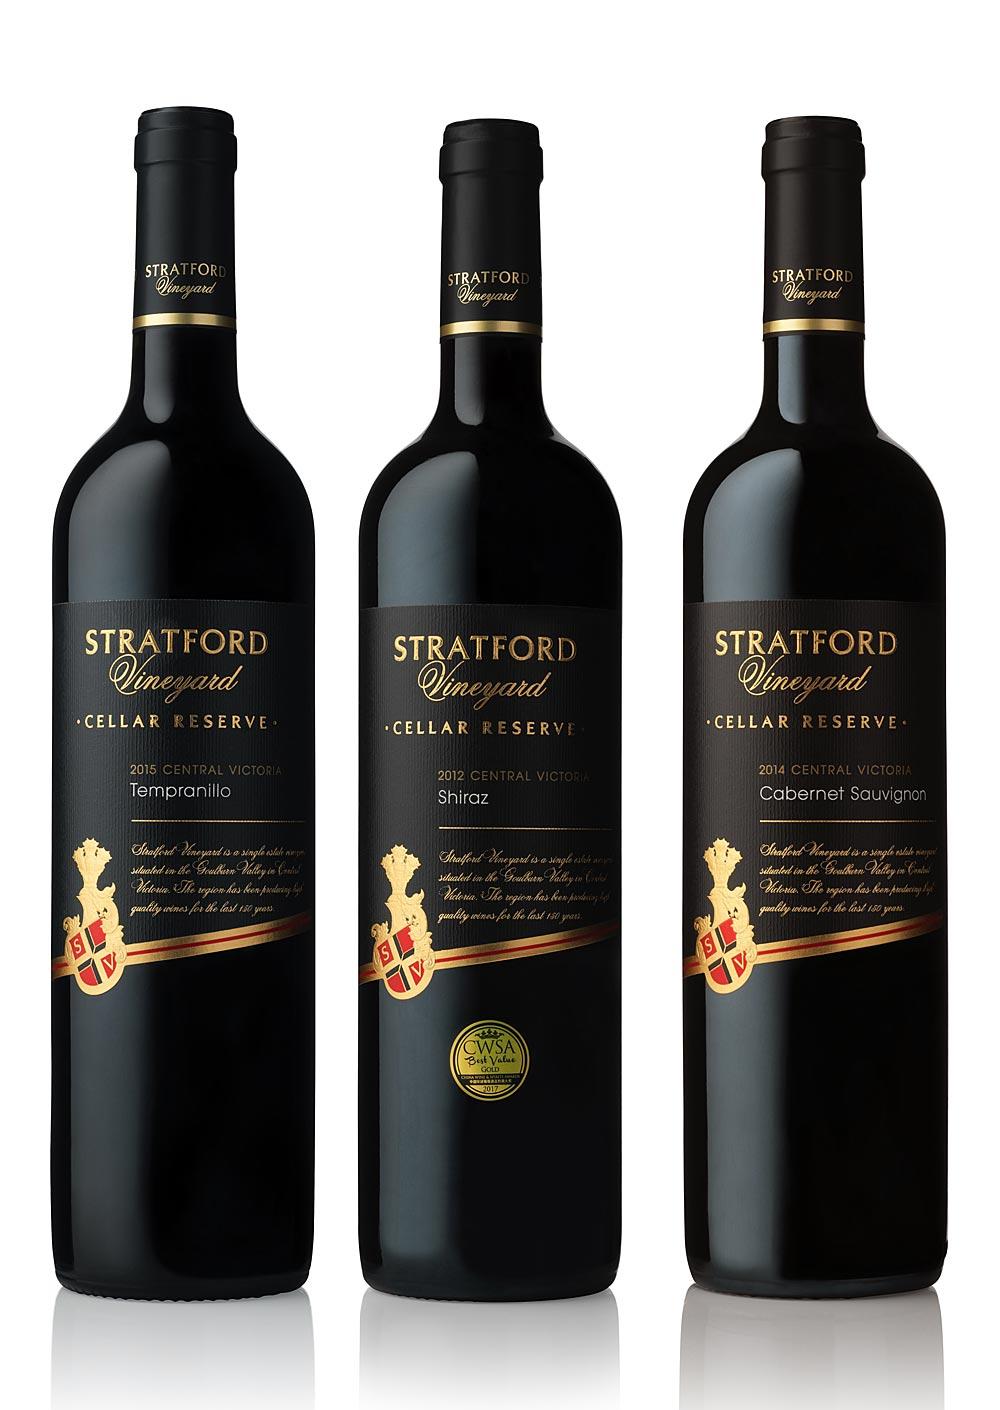 Studio Wine Bottle Photography in our Melbourne Studio for Stratford Vineyard